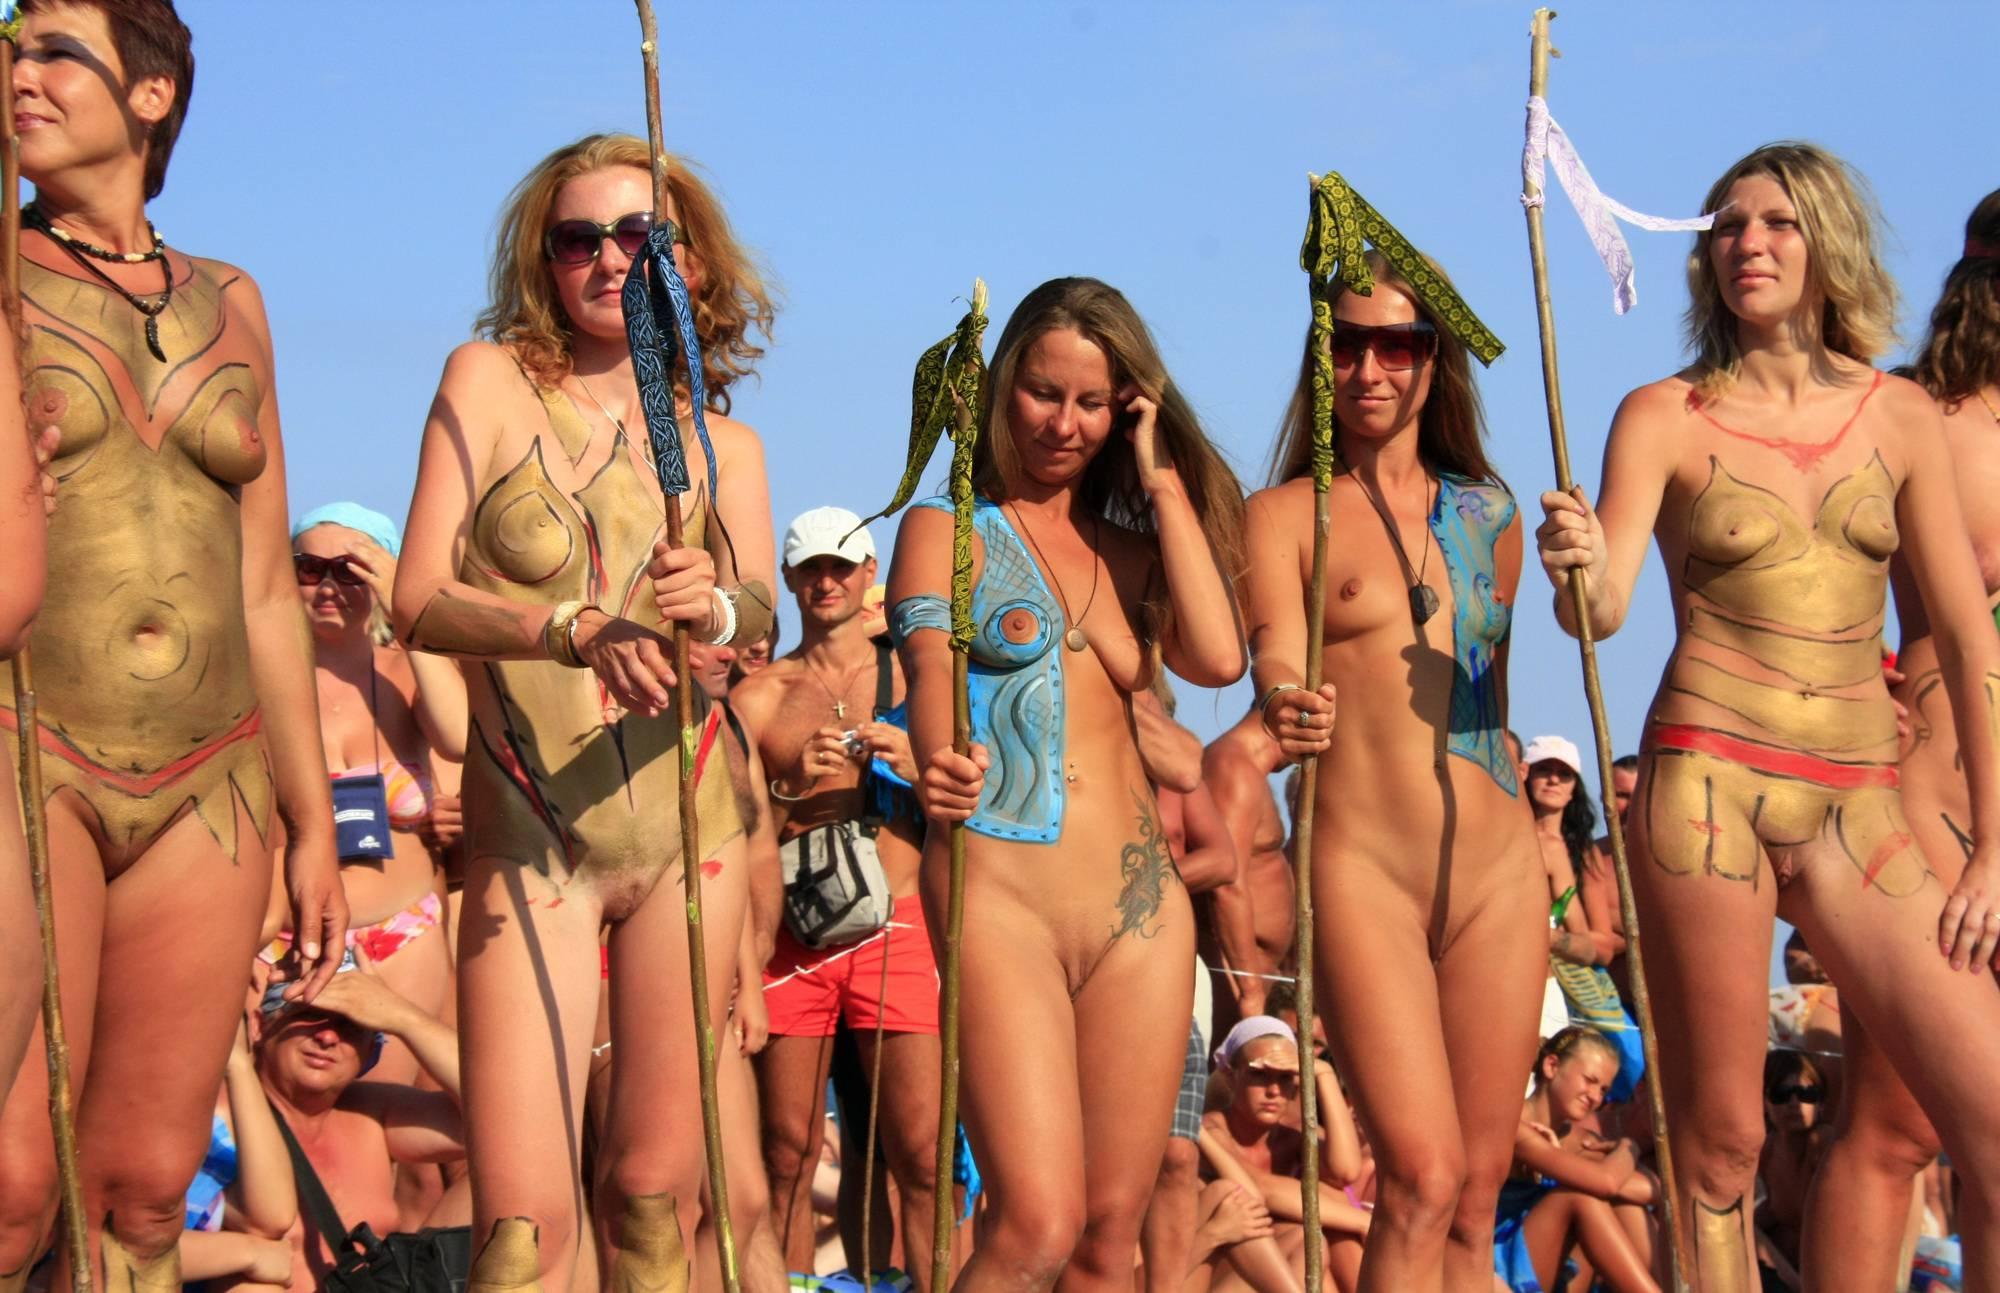 Nudist Pics Neptune Standing Crowds - 1